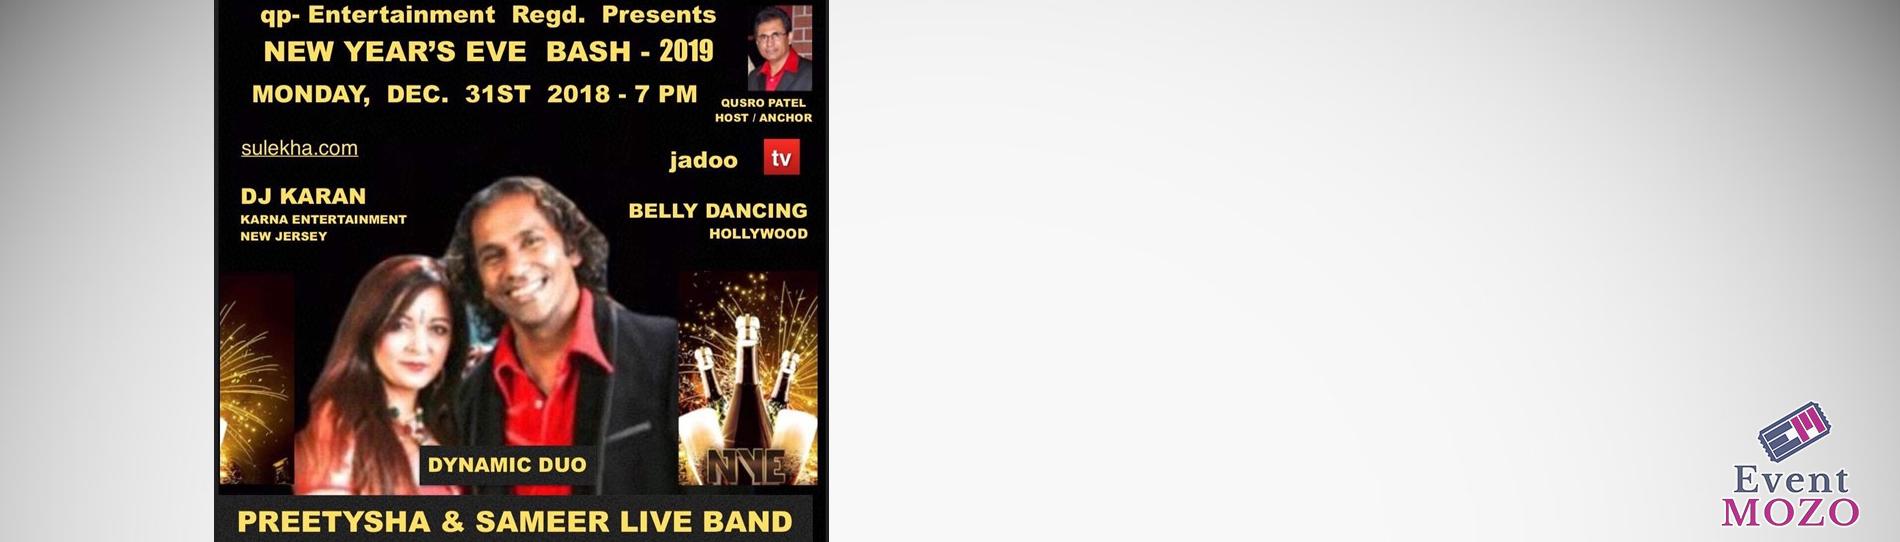 EventMozo QUSRO PATEL Presents New Years Eve 2019 with Preetysha and Sameer